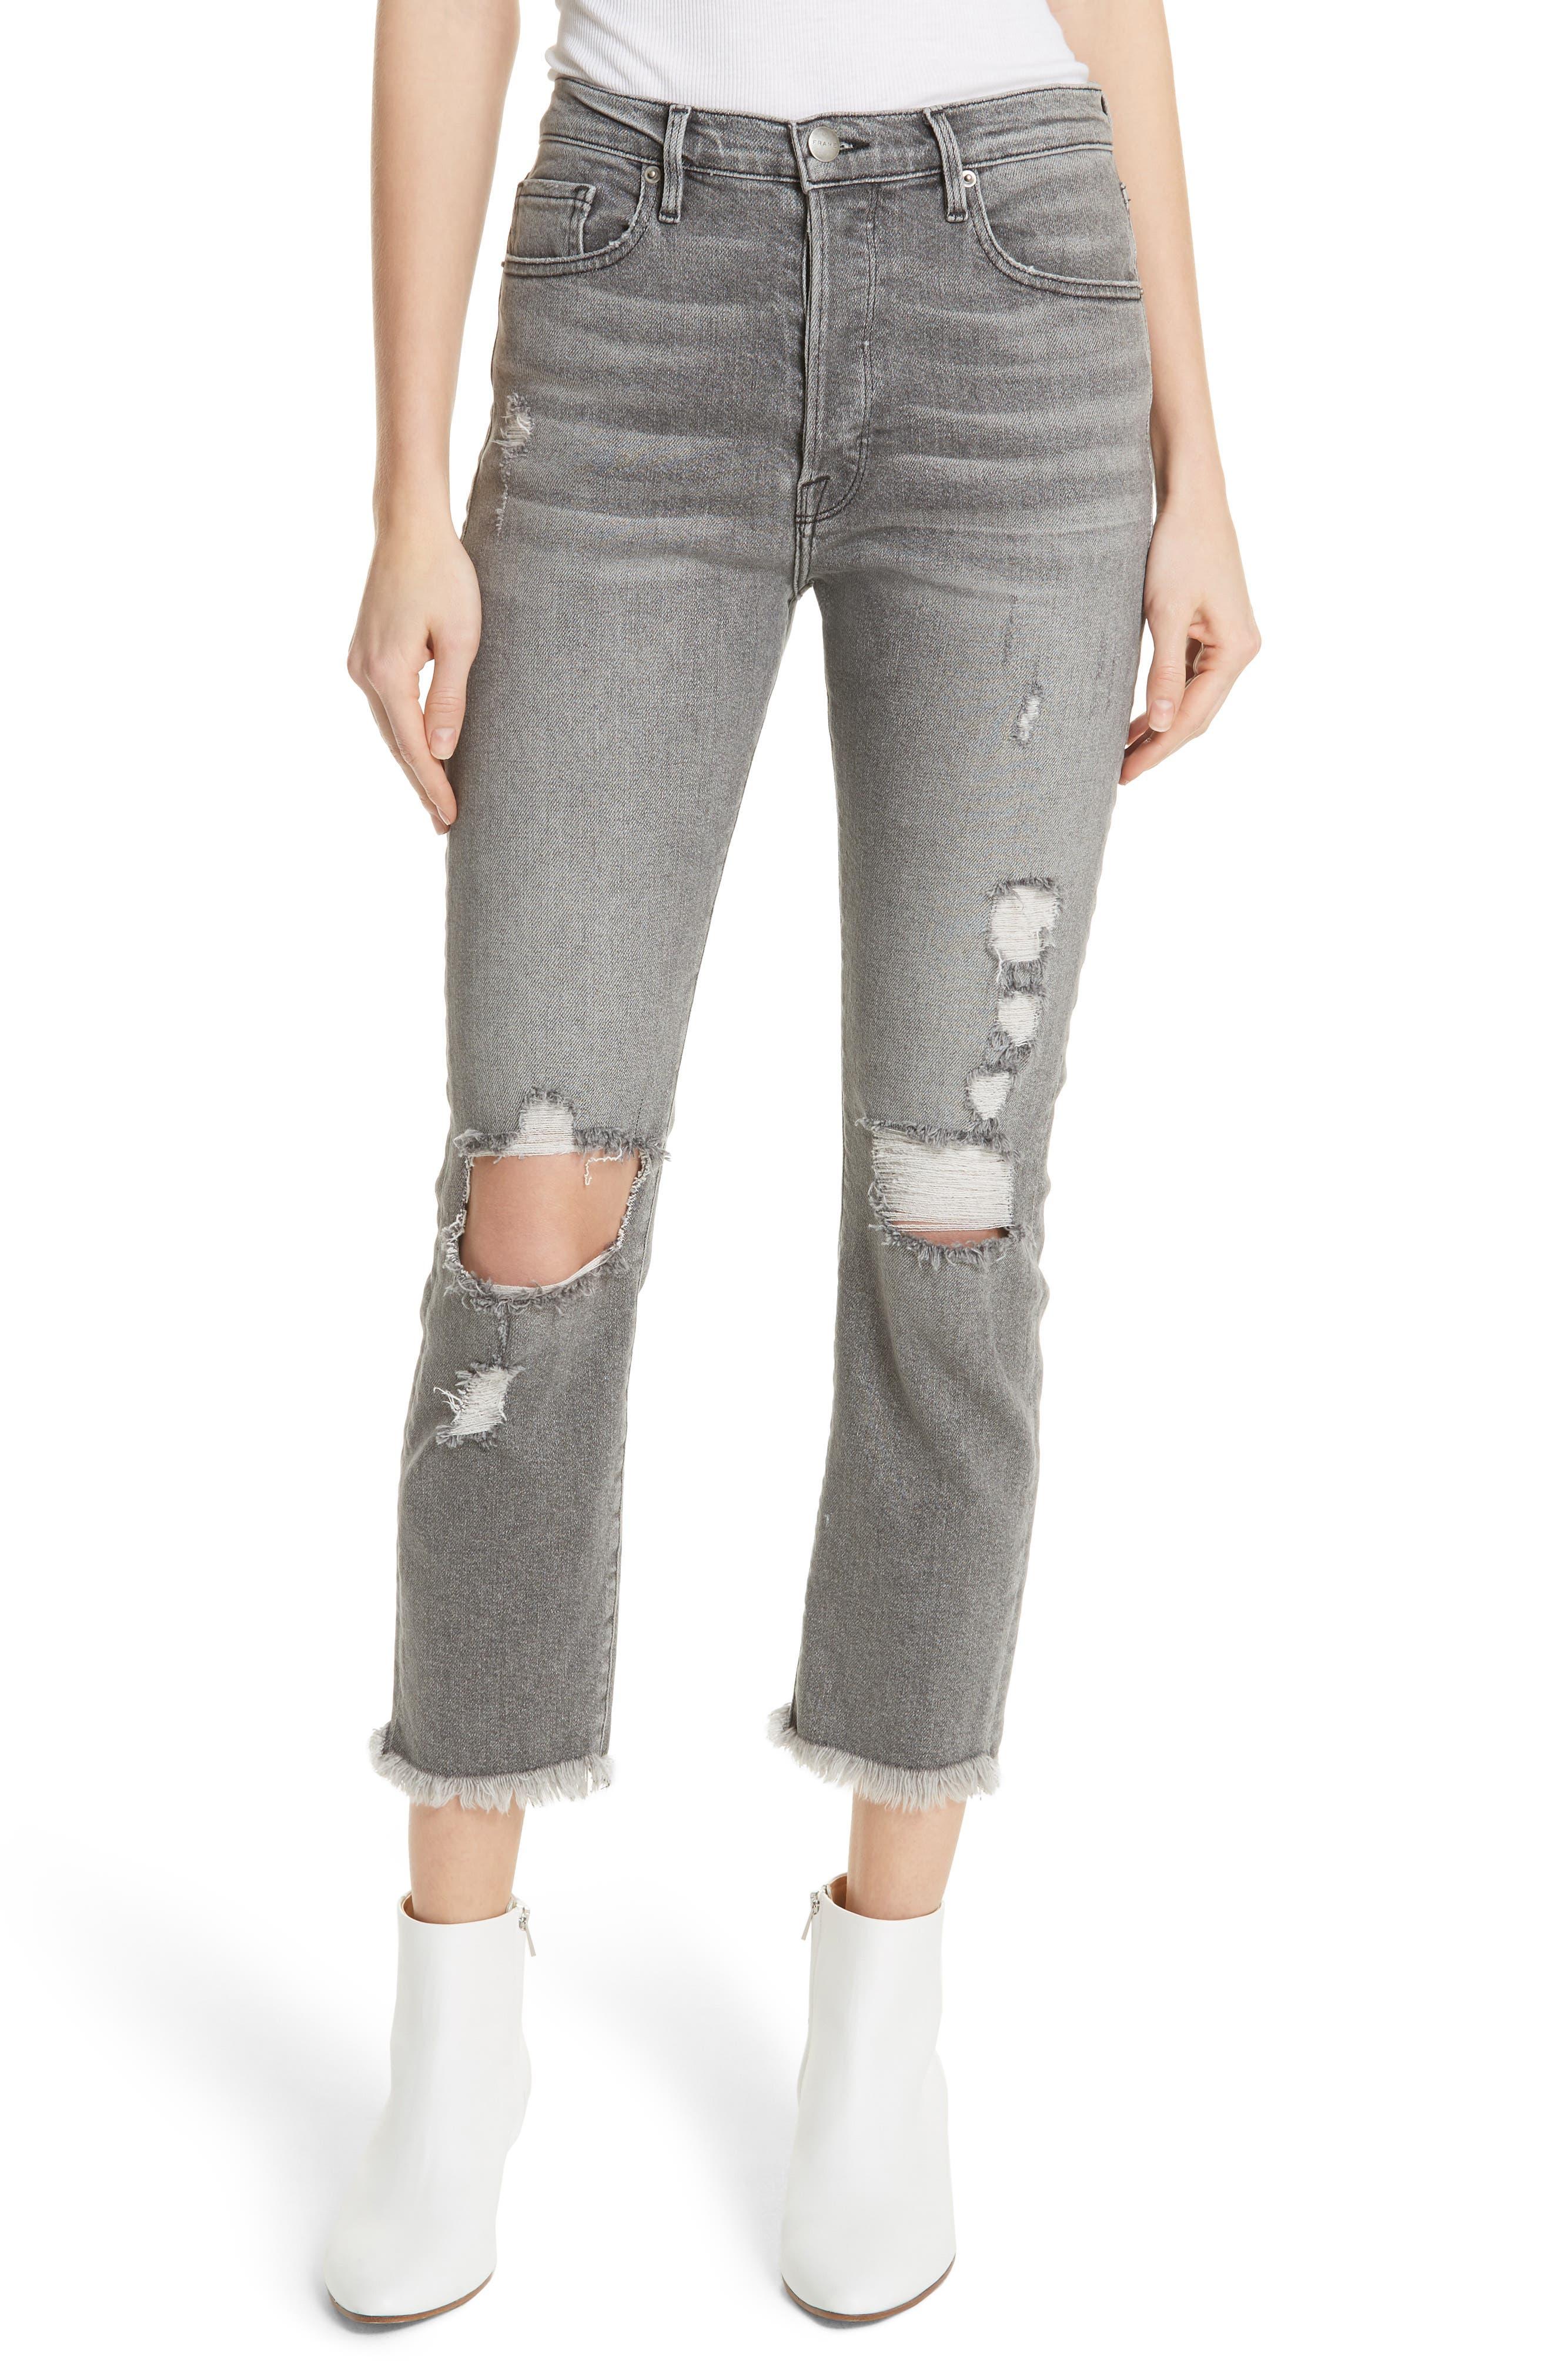 Le Original High Waist Raw Edge Jeans,                             Main thumbnail 1, color,                             COLD ASH